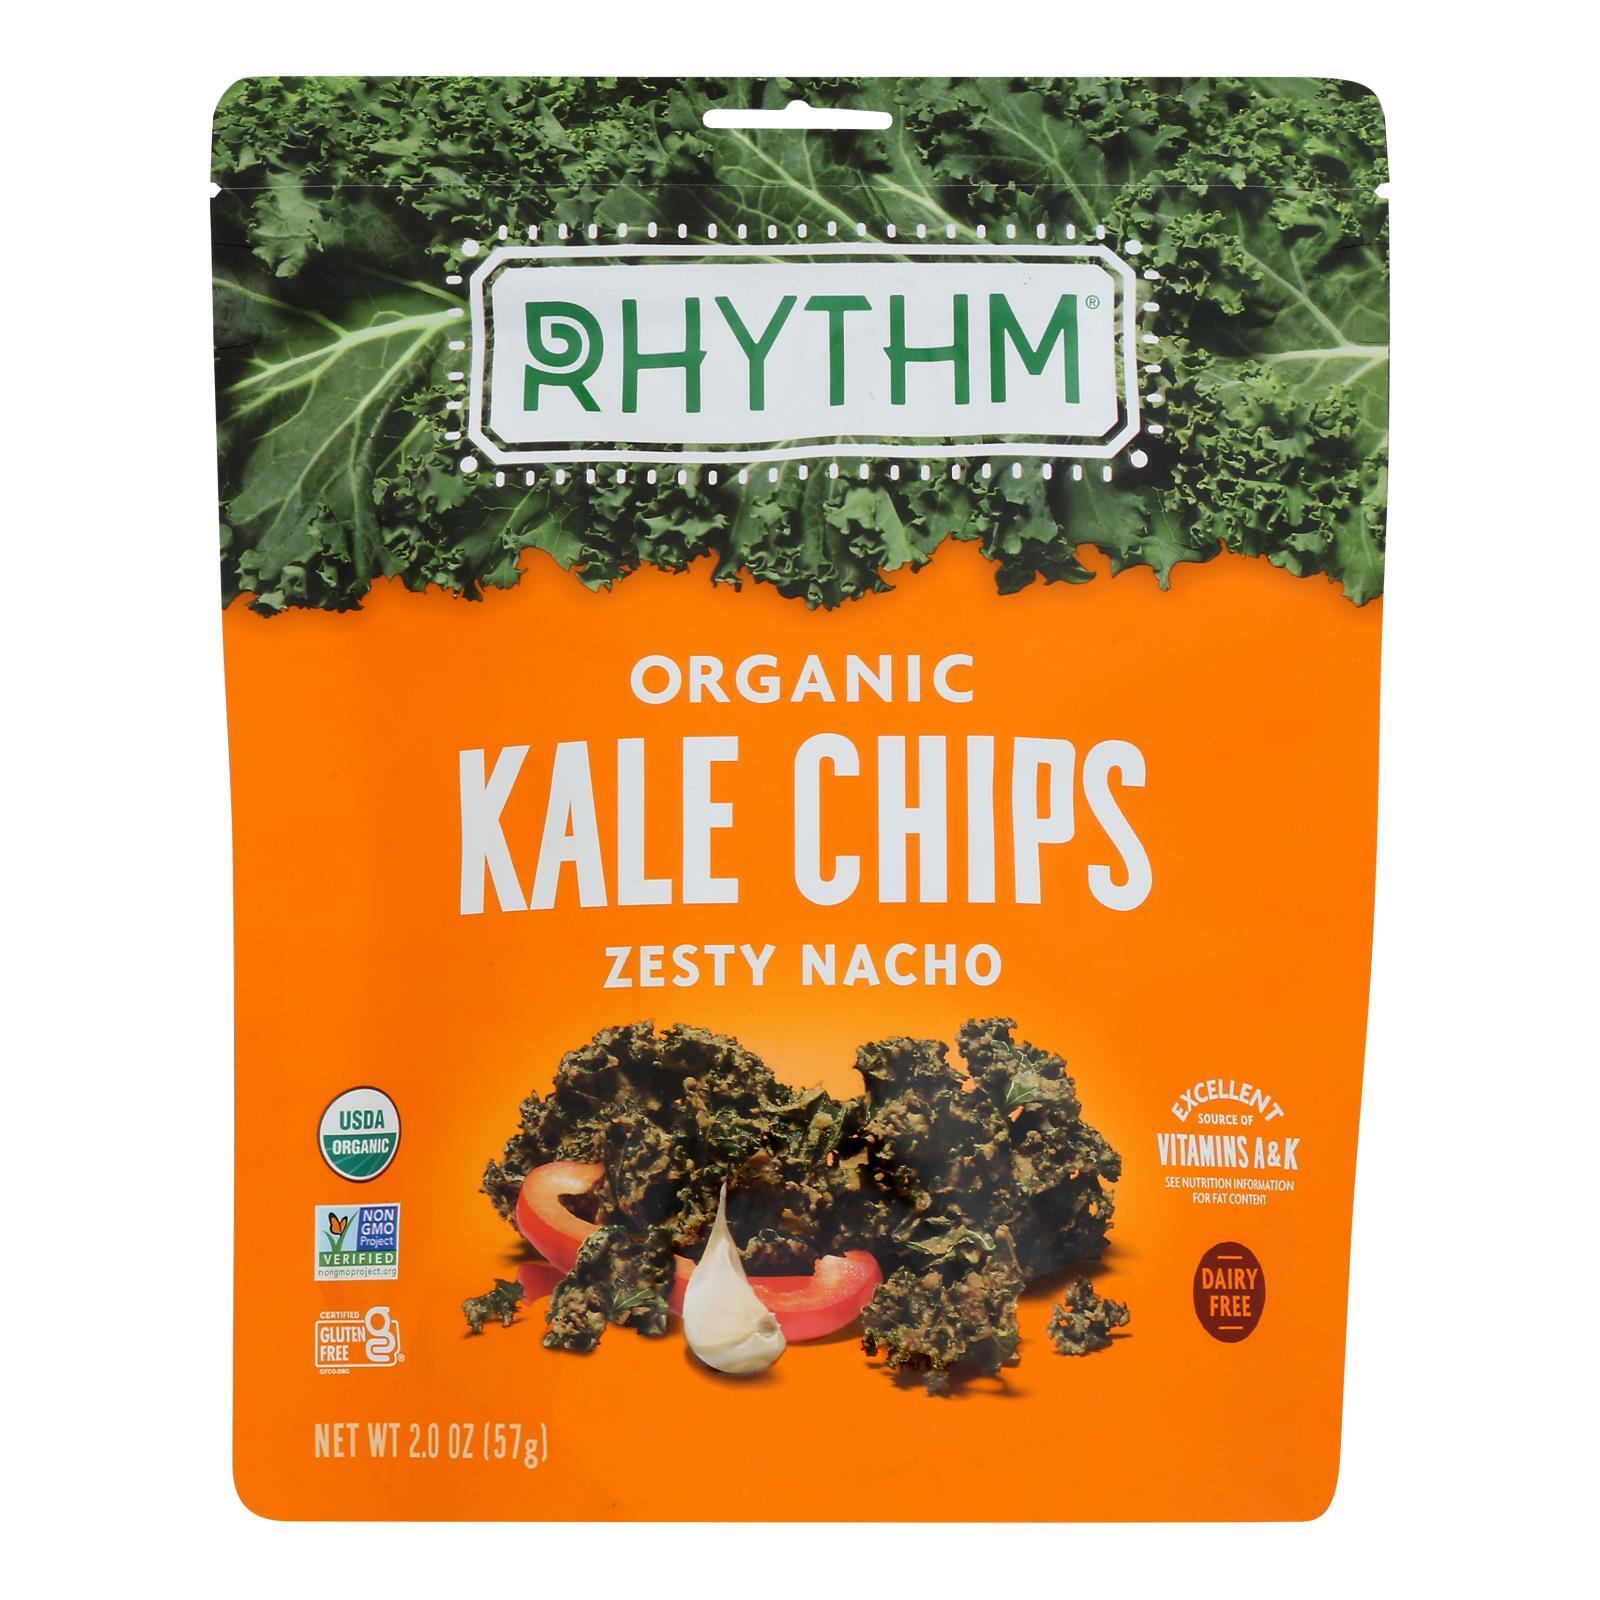 Rhythm Superfoods Kale Chips - Zesty Nacho - Case of 12 - 2 oz.